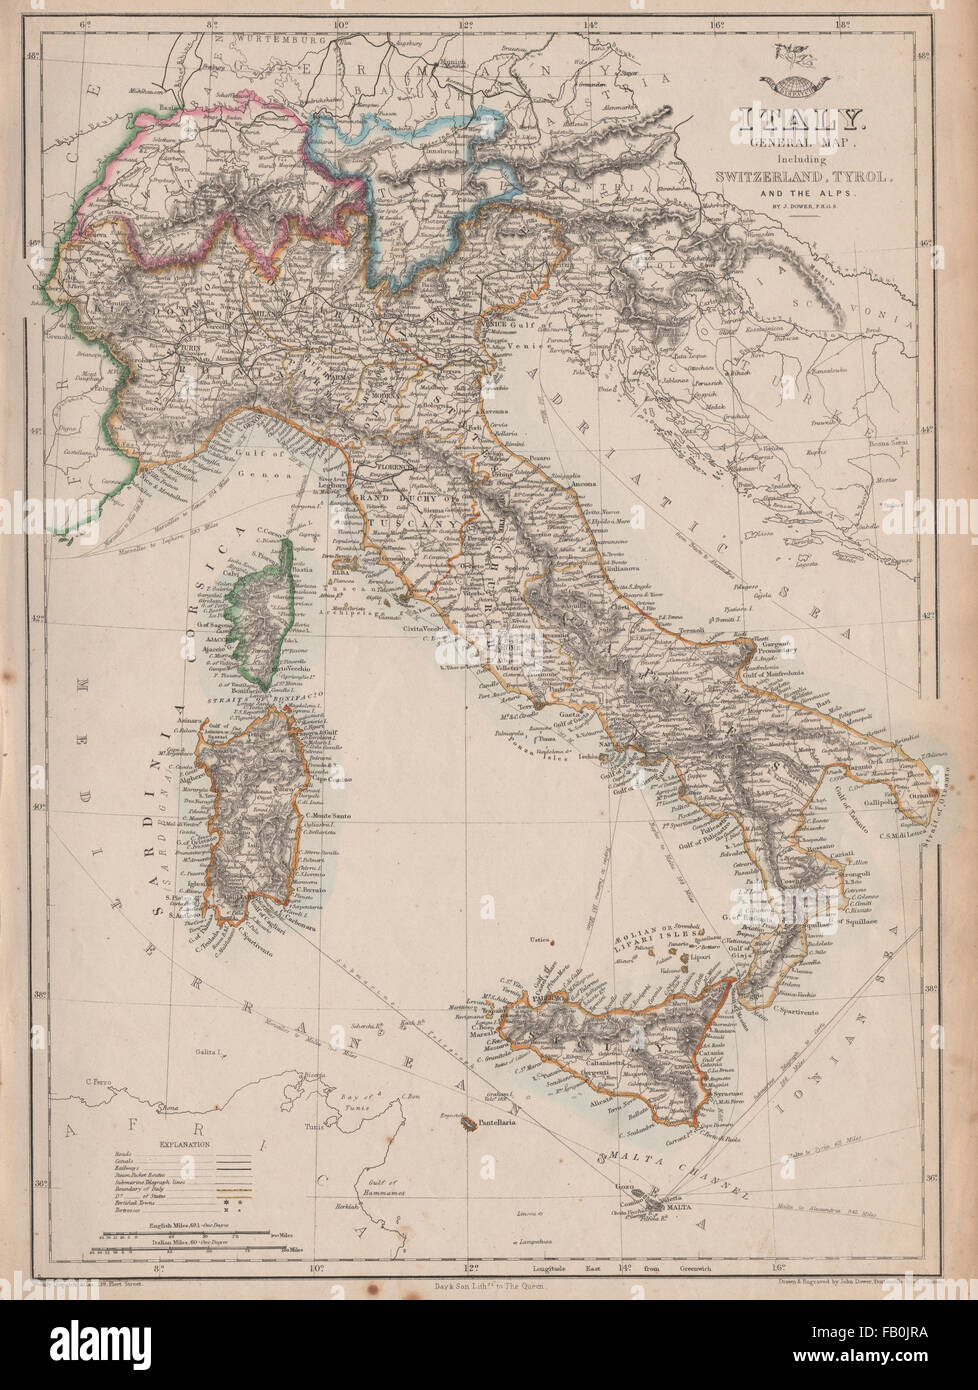 Italy switzerland tyrol alps italian unificationwerdispatch italy switzerland tyrol alps italian unificationwerdispatch atlas 1862 map gumiabroncs Choice Image